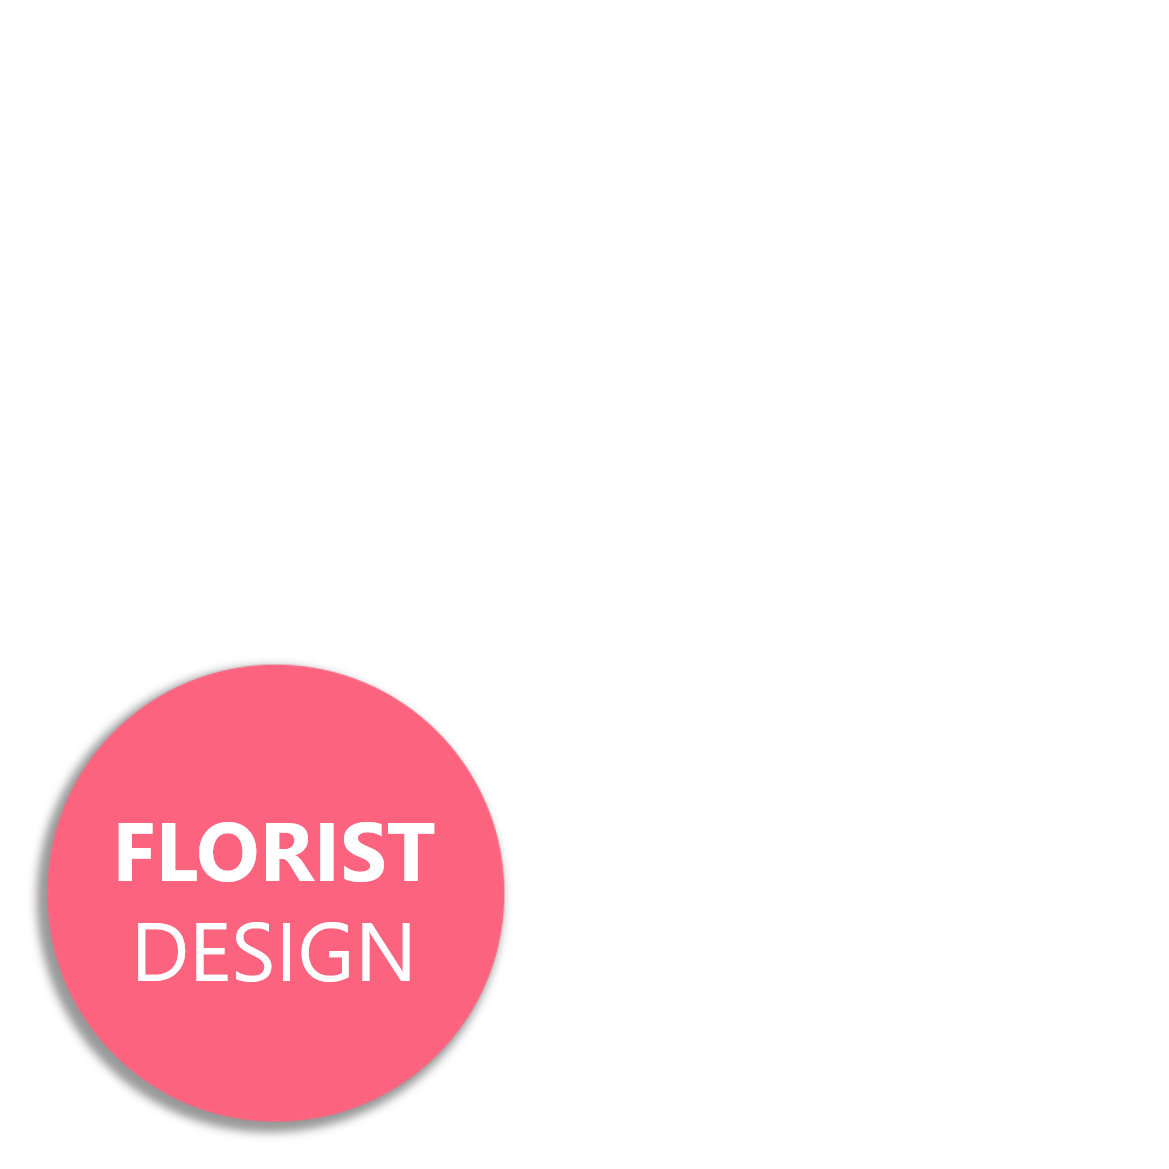 Florist Design Pink_overlay